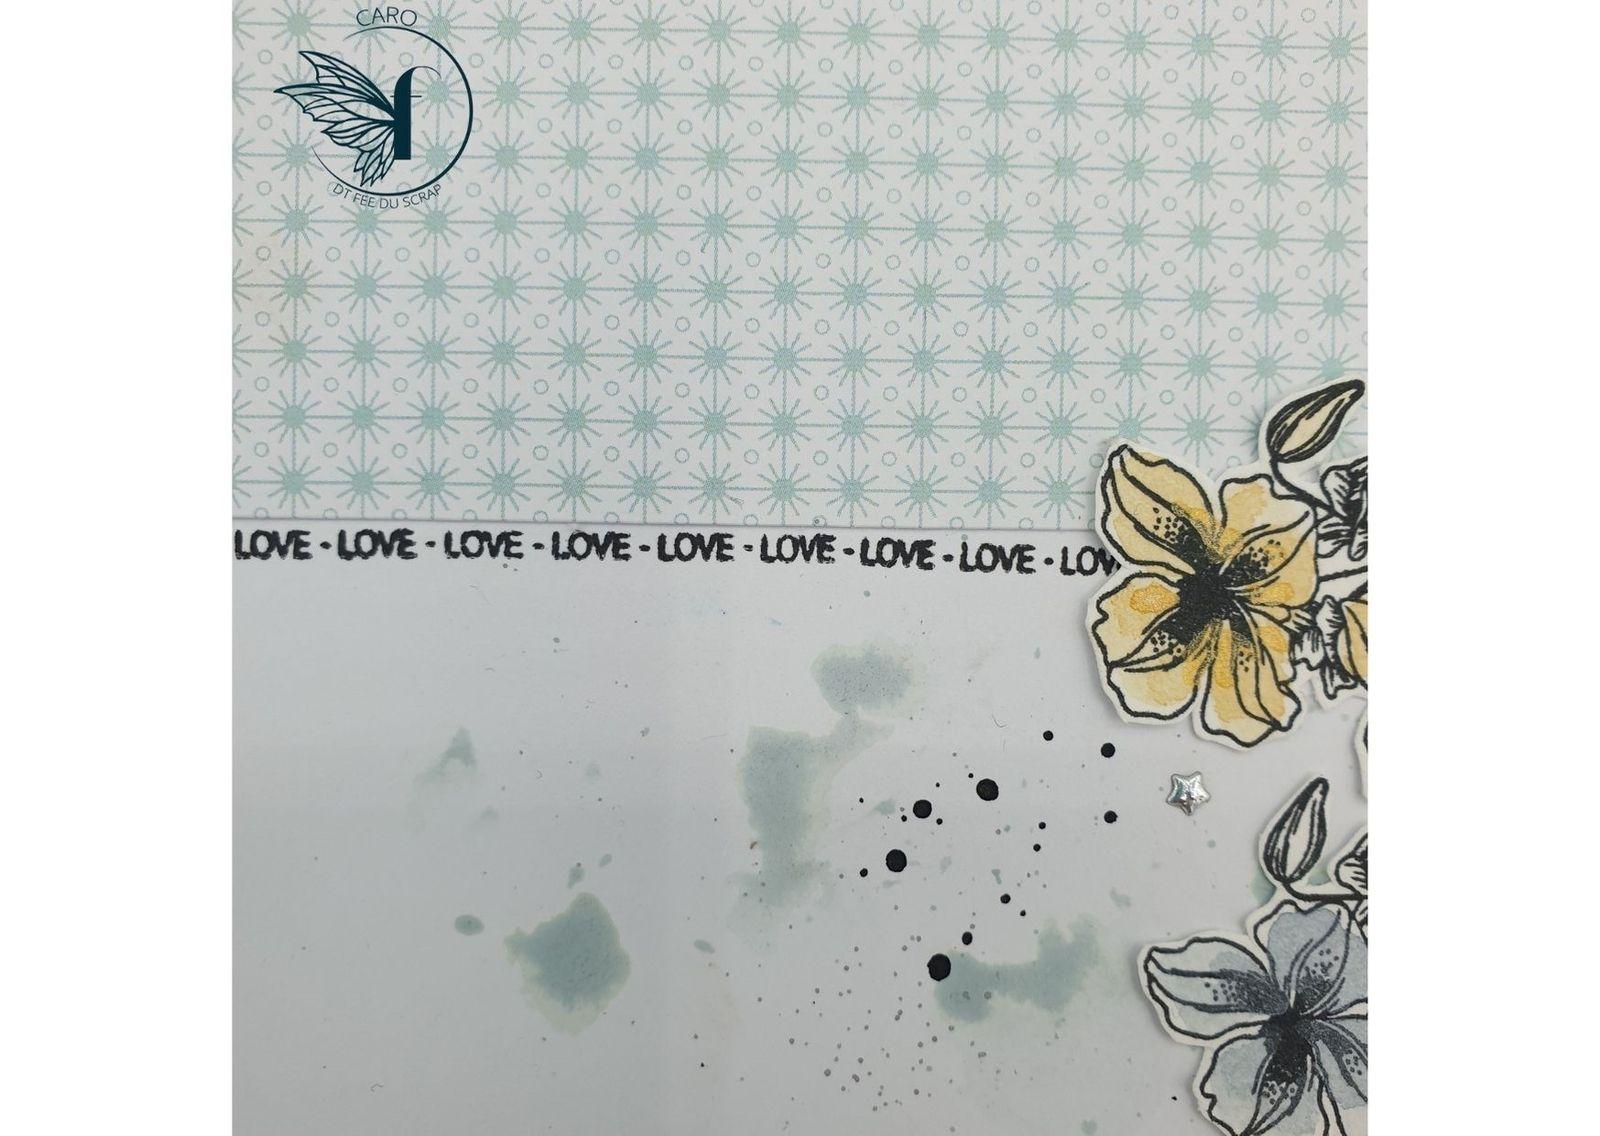 Caro : page My love